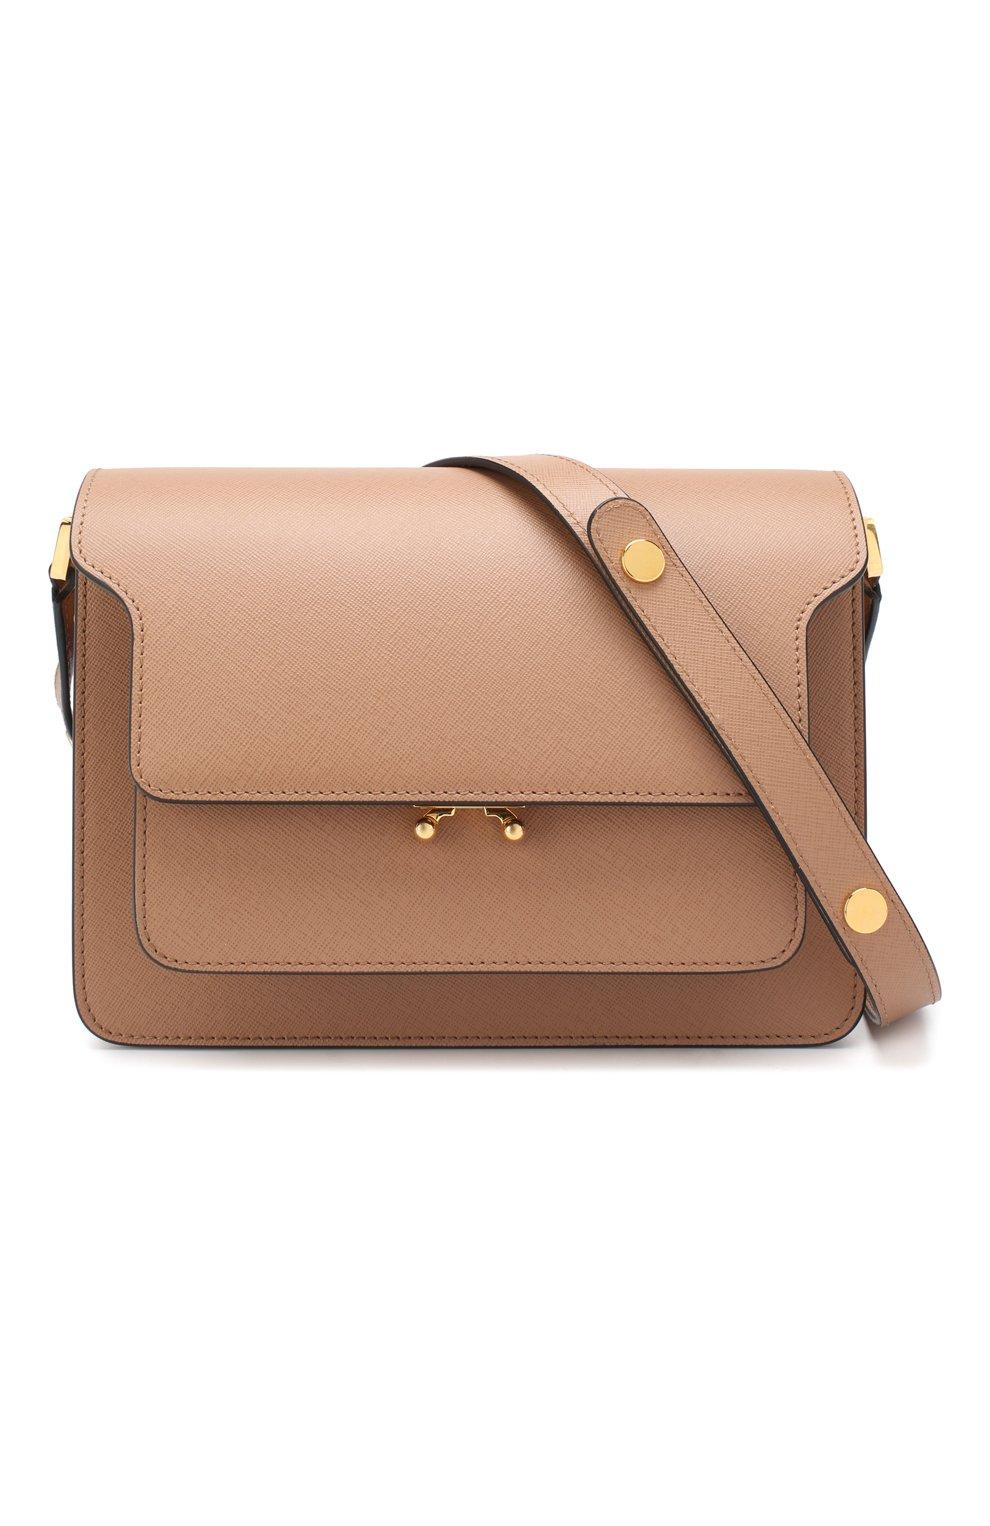 Женская сумка trunk MARNI светло-коричневого цвета, арт. SBMPN09N01/LV520 | Фото 6